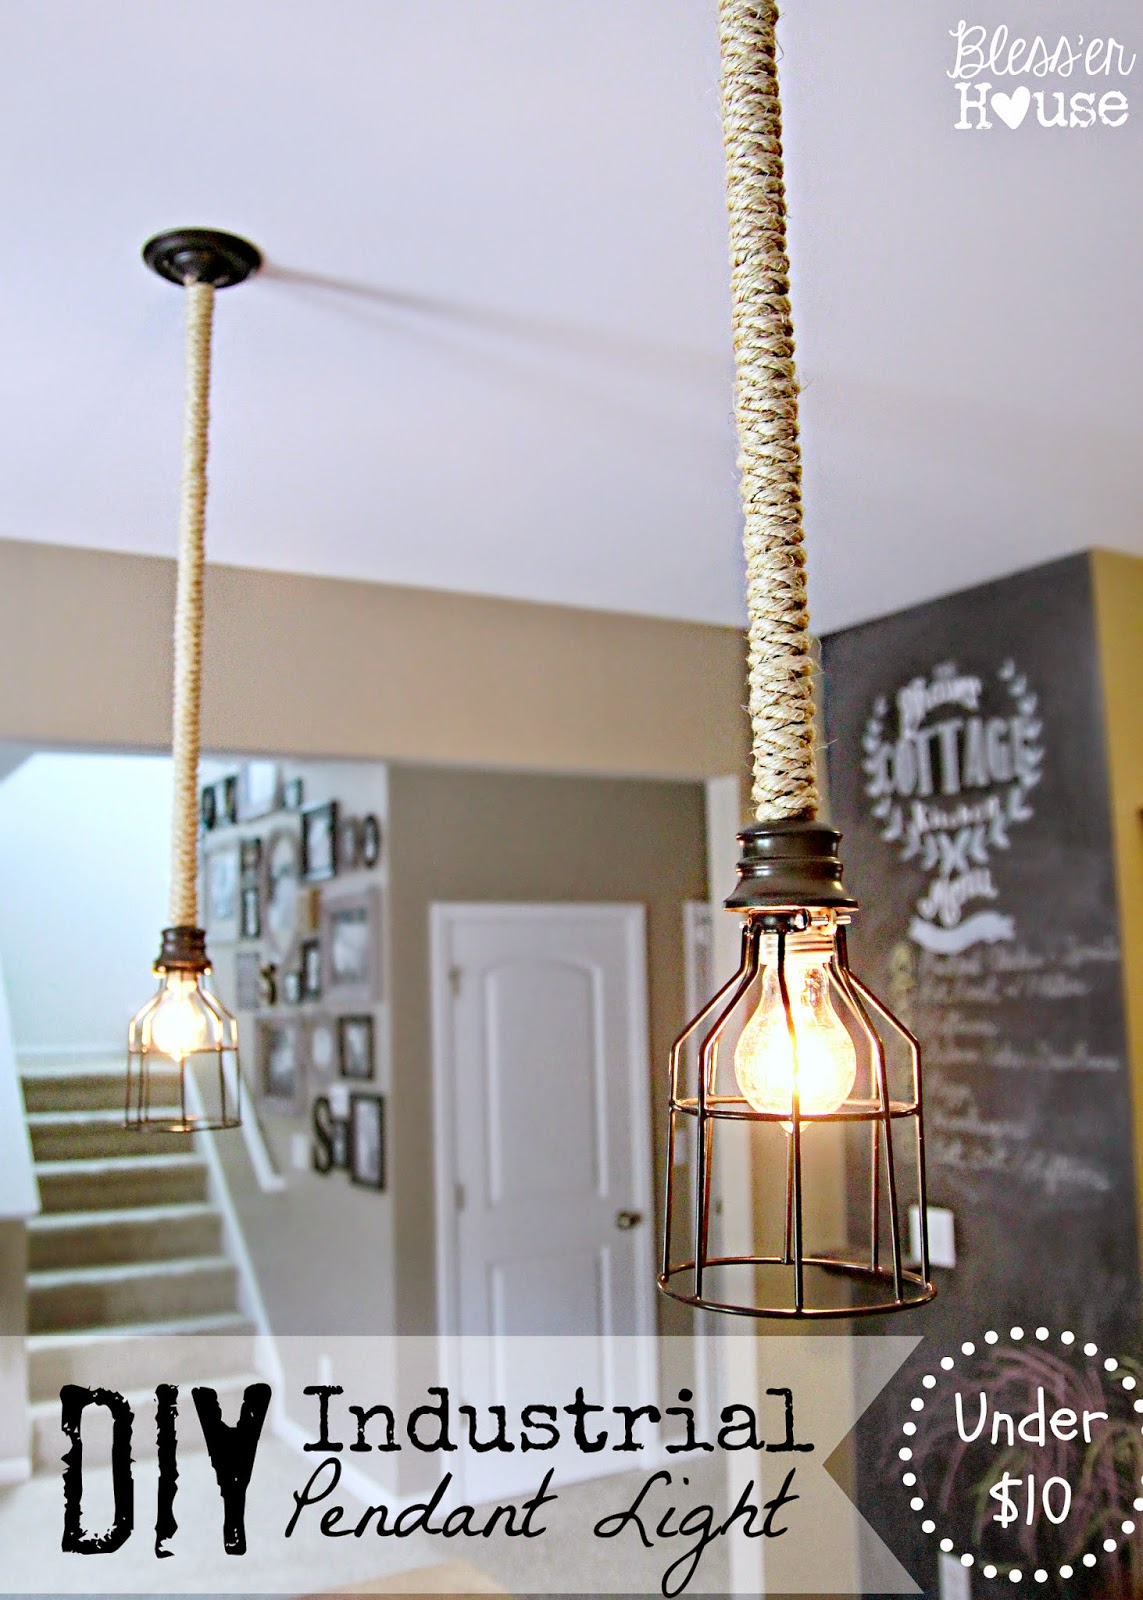 5 DIY Industrial Light Fixtures for Under $25 - Bless'er House